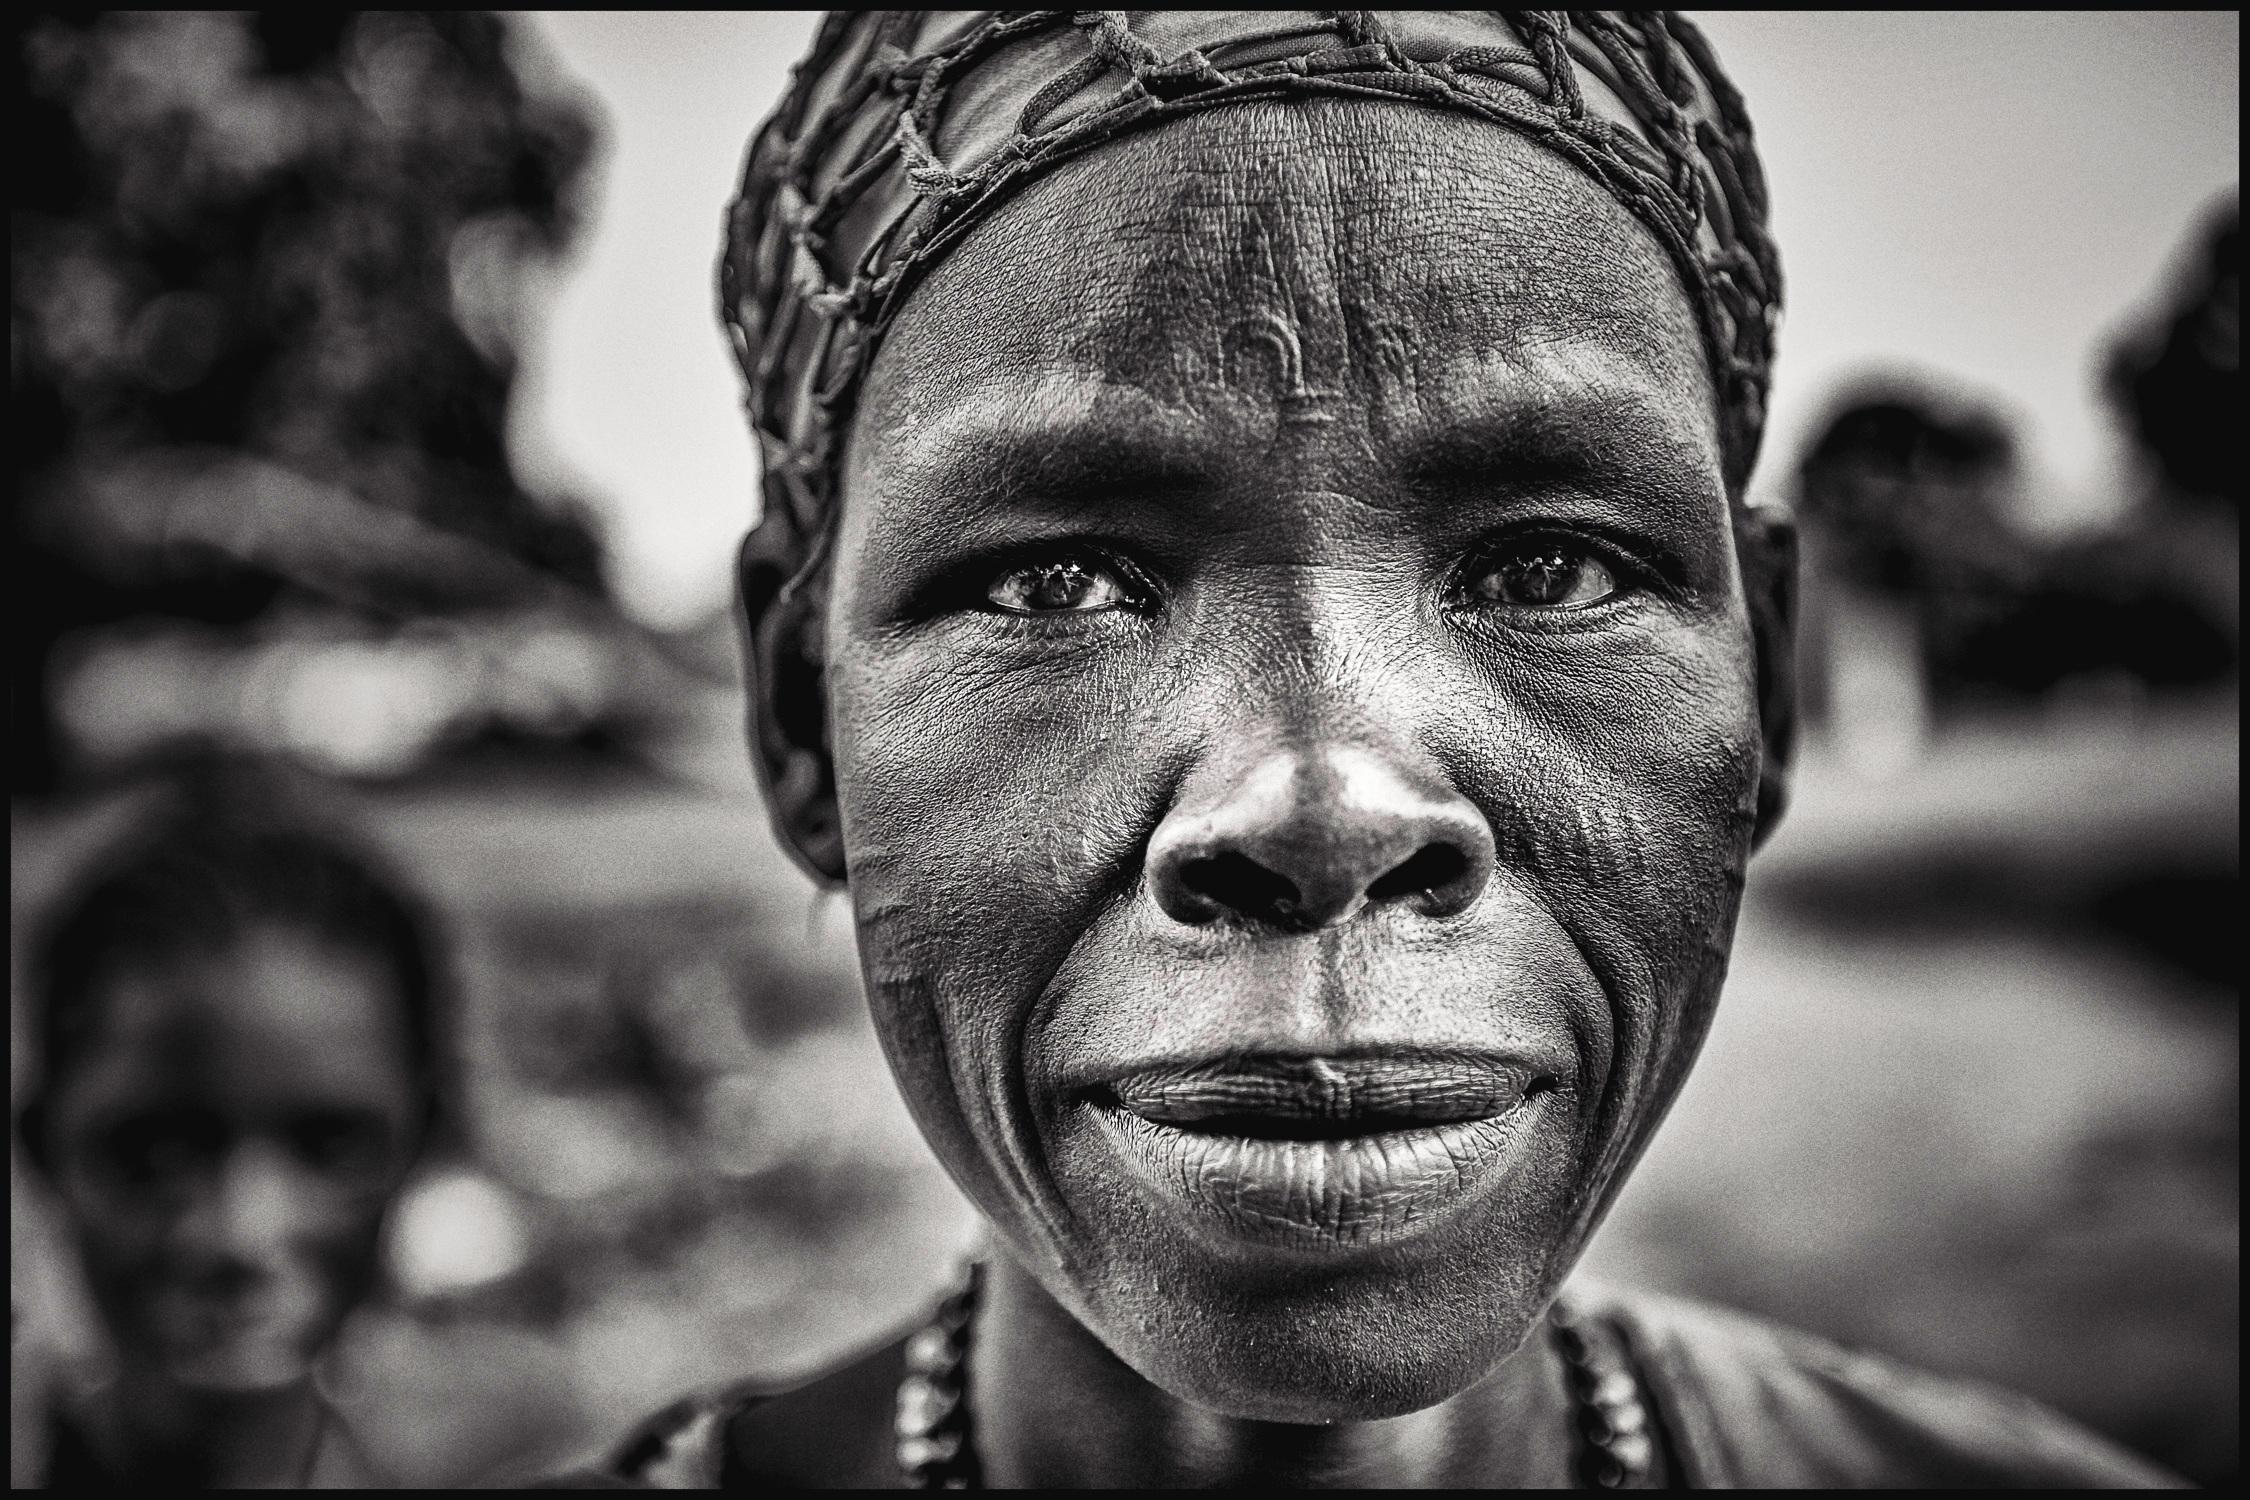 CENTR_AFRIKA-203-bewerkt.jpg